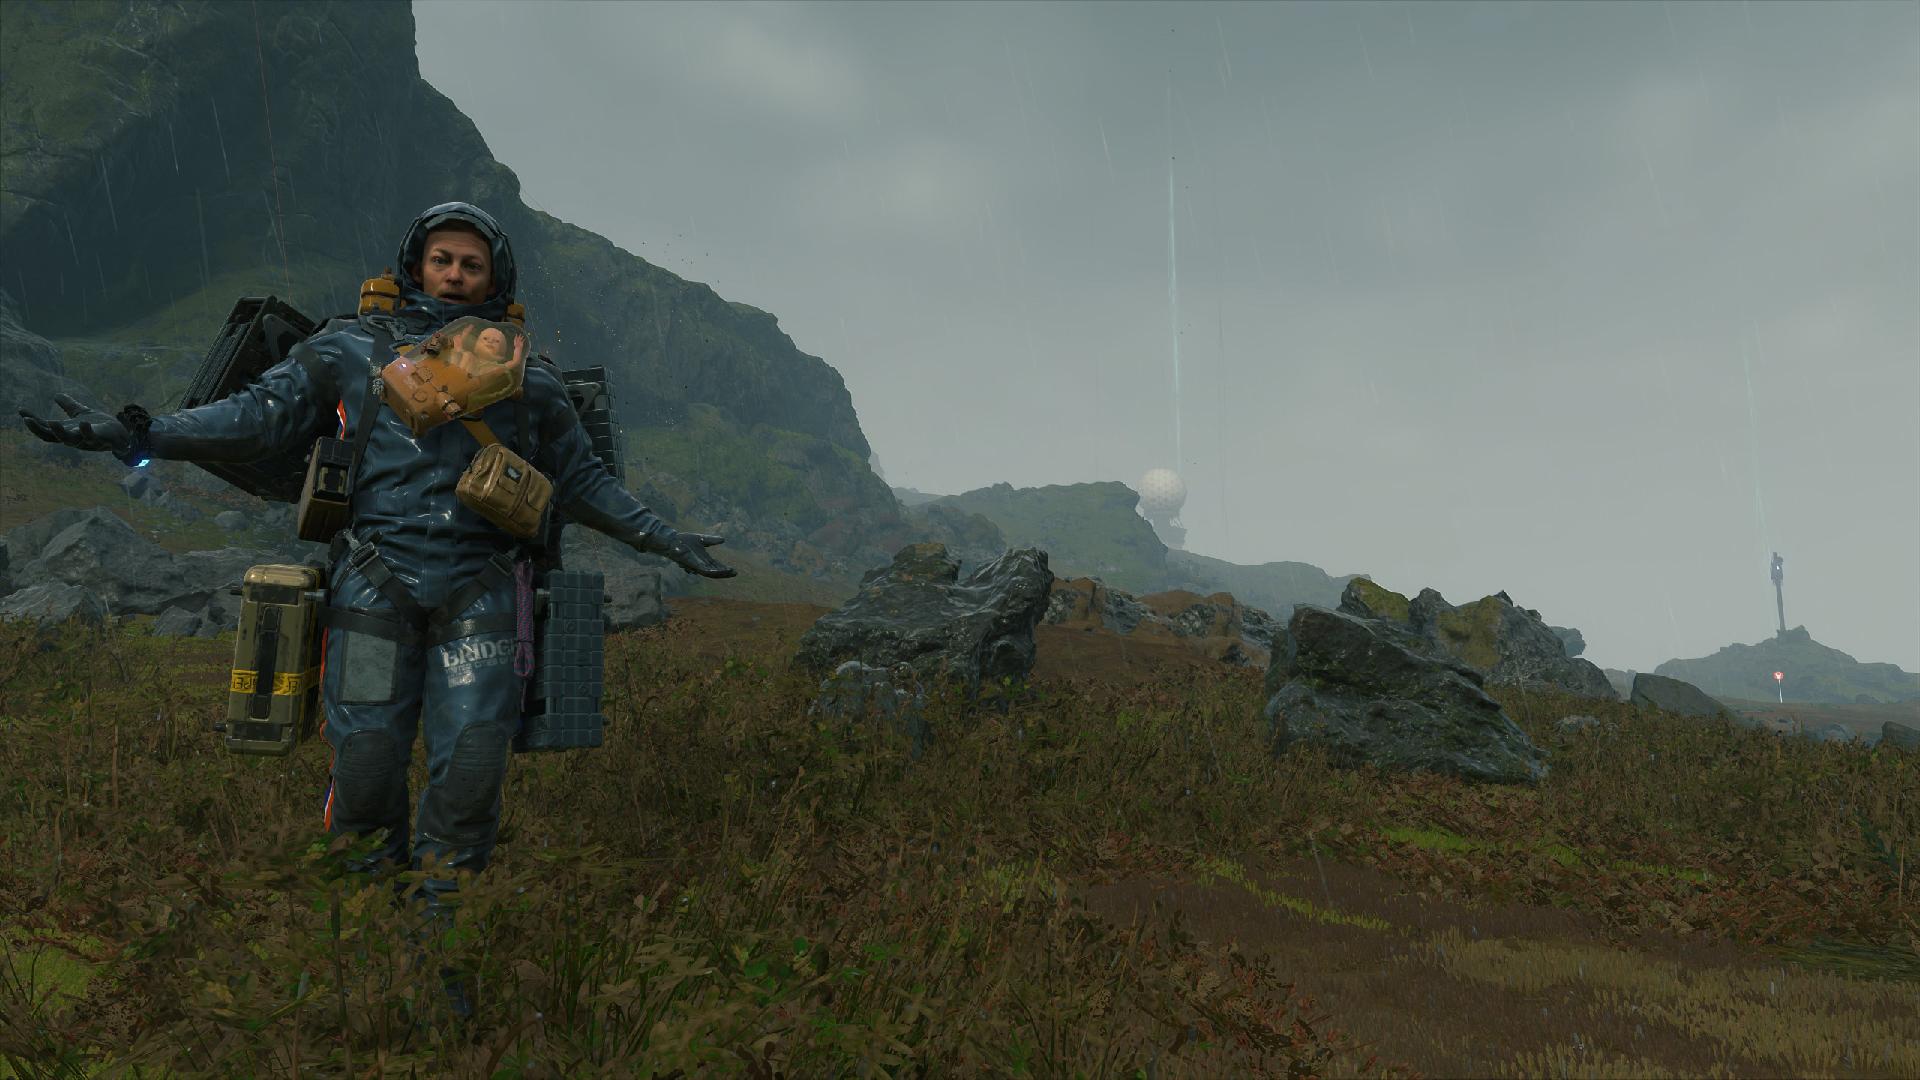 Death Stranding on PC has a Half-Life crossover and runs beautifully screenshot